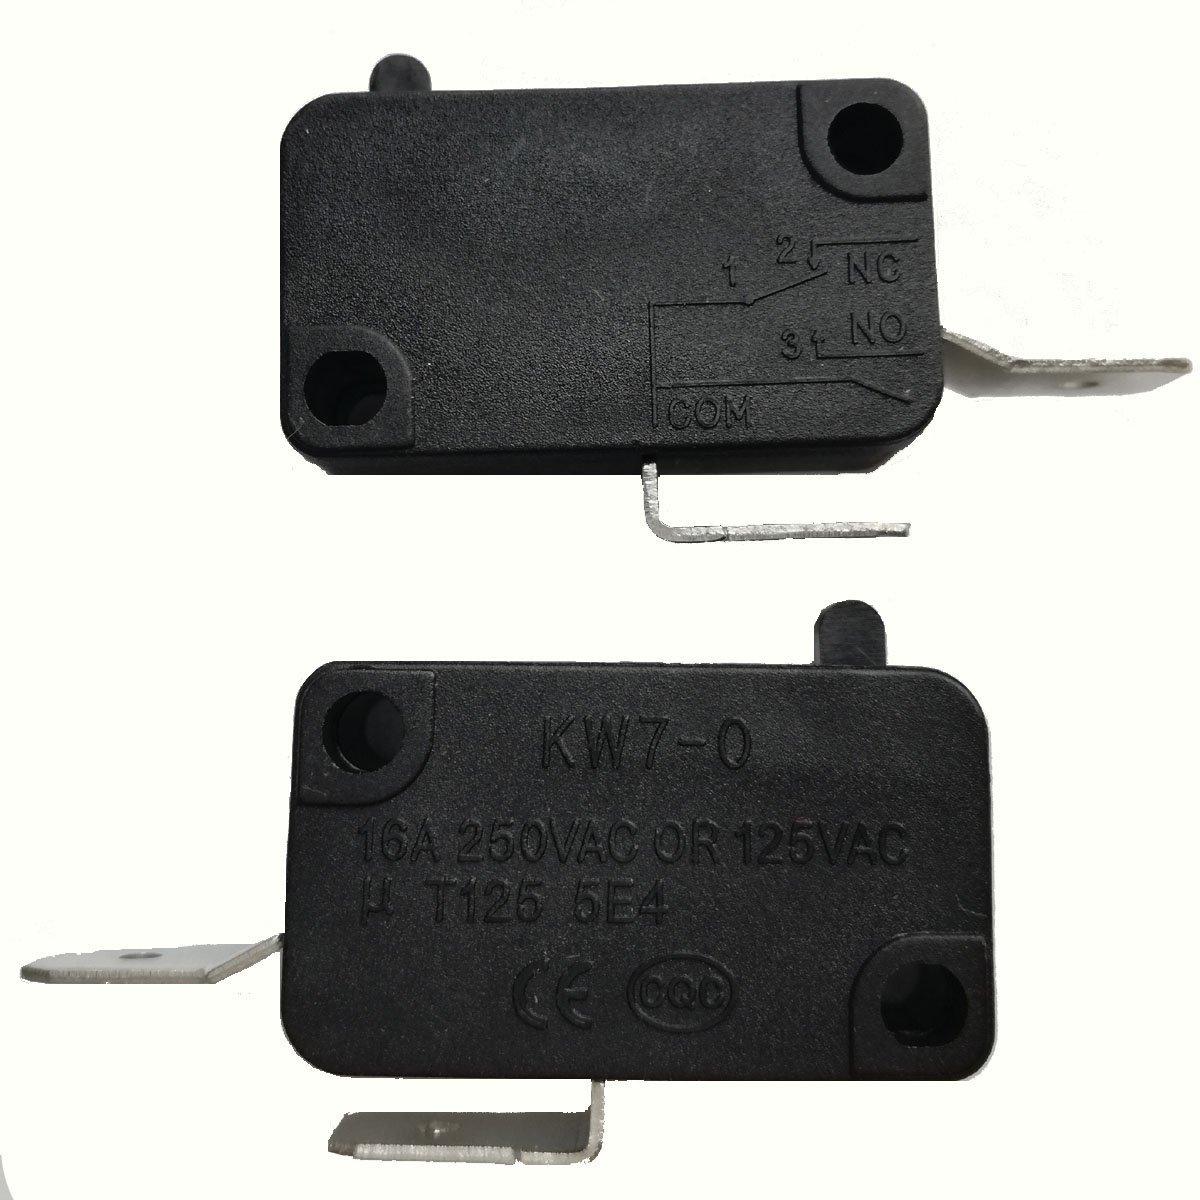 Buy 10pcs 16A 250VAC T125 5E4 Microswitch Micro Switch Sensitive ...